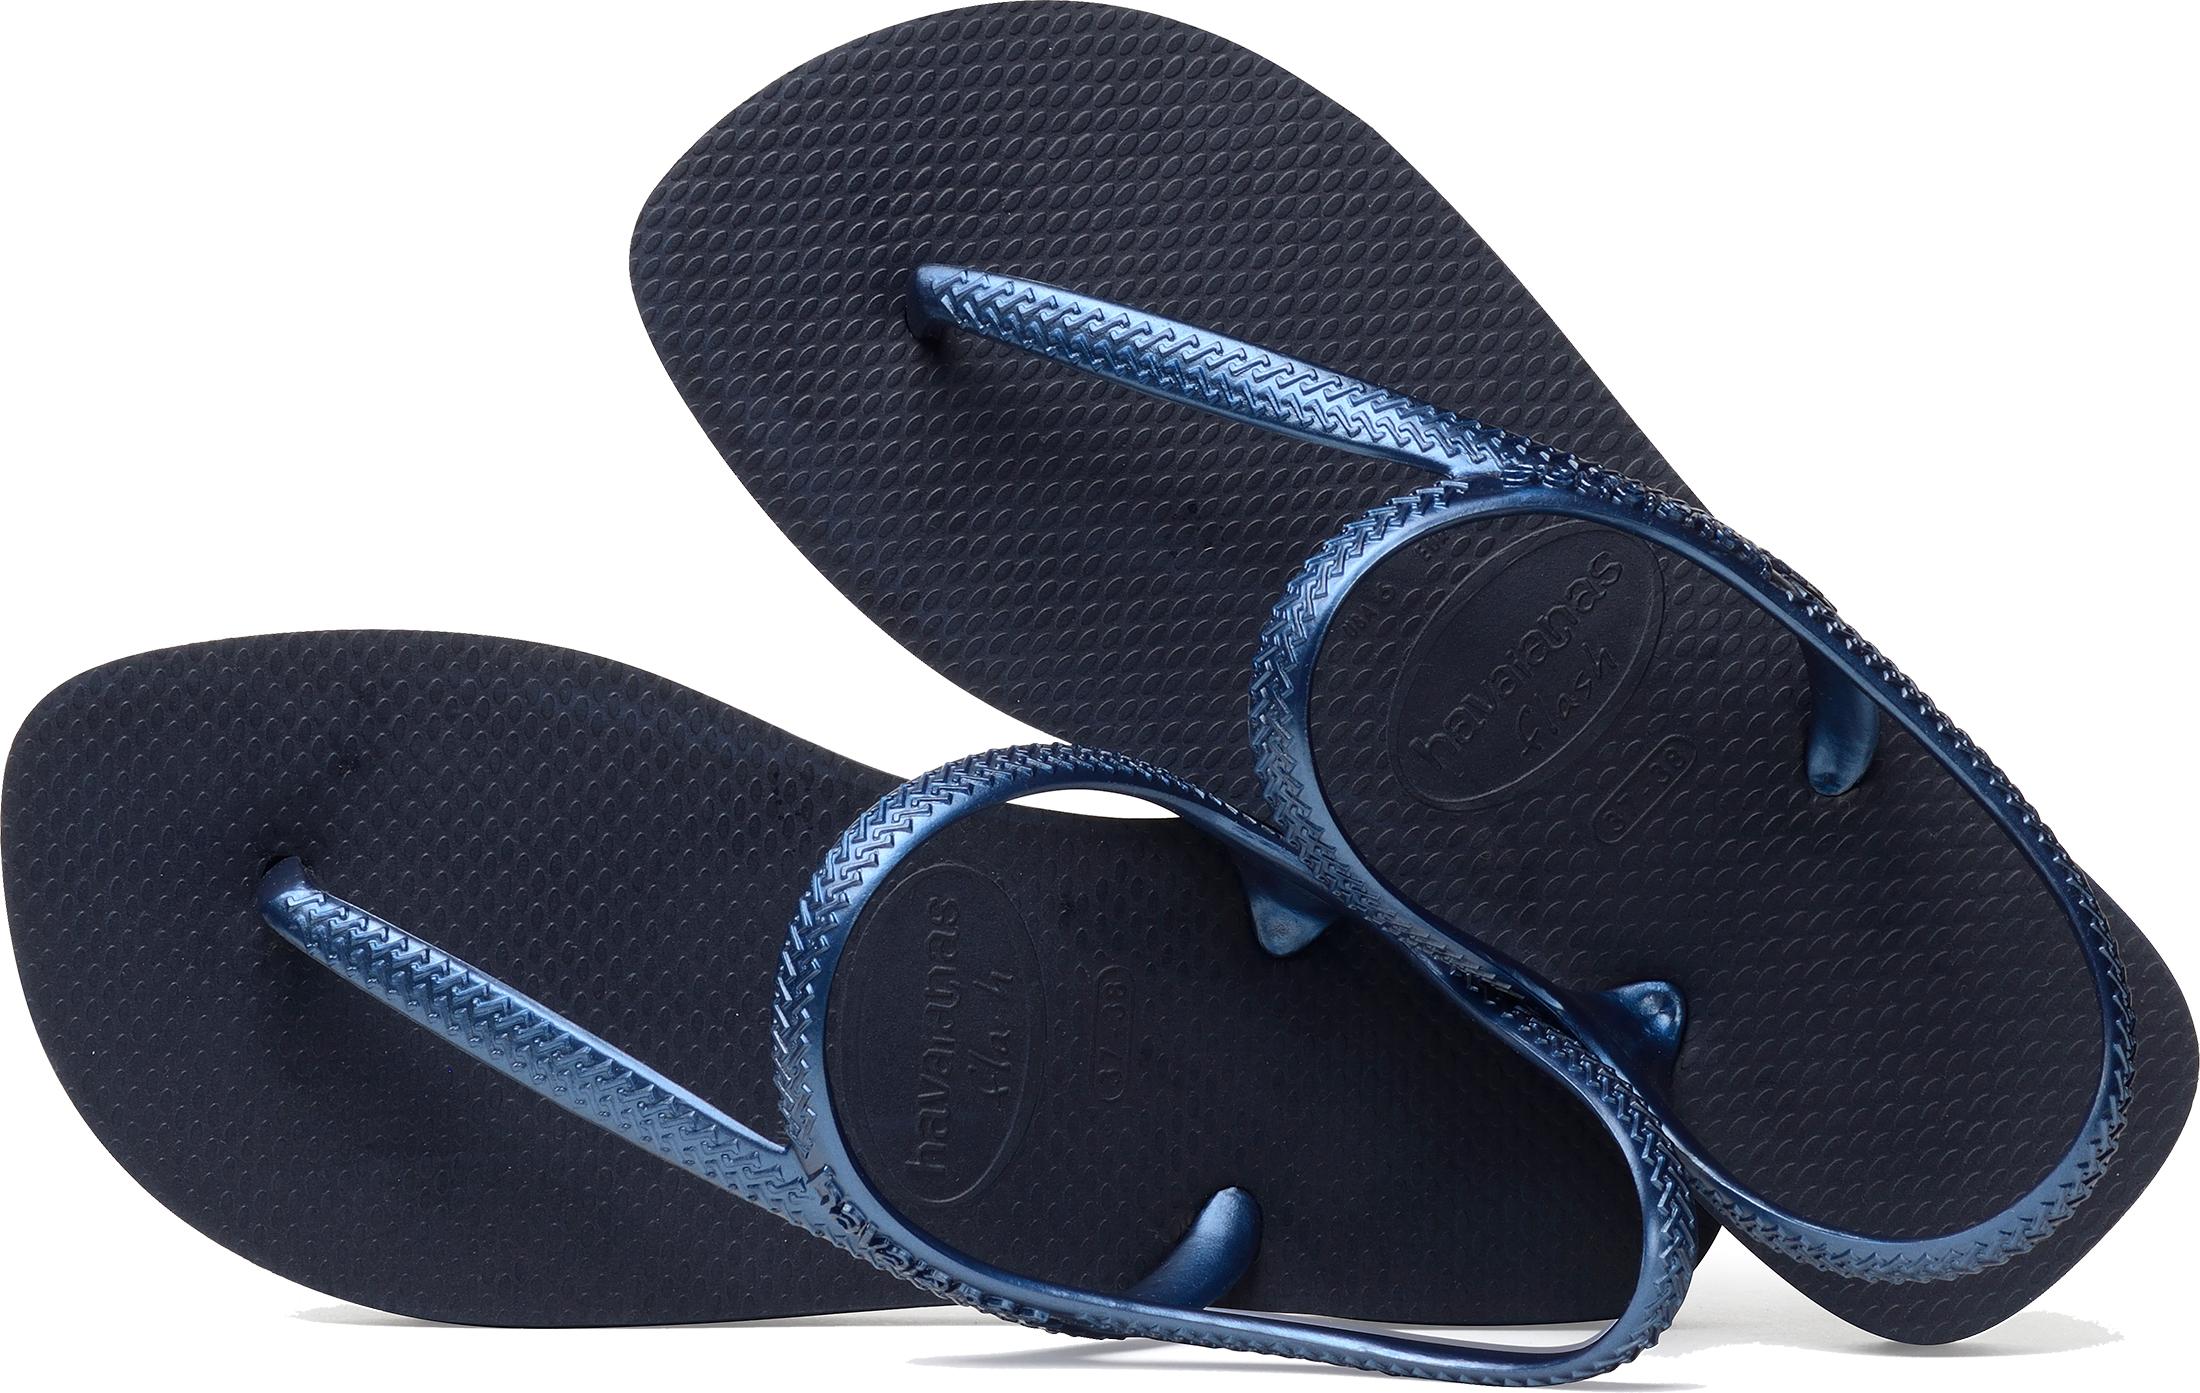 32bba5756 Havaianas Flash Urban Women s Flip Flops With Ankle Strap. Uk5 Navy ...